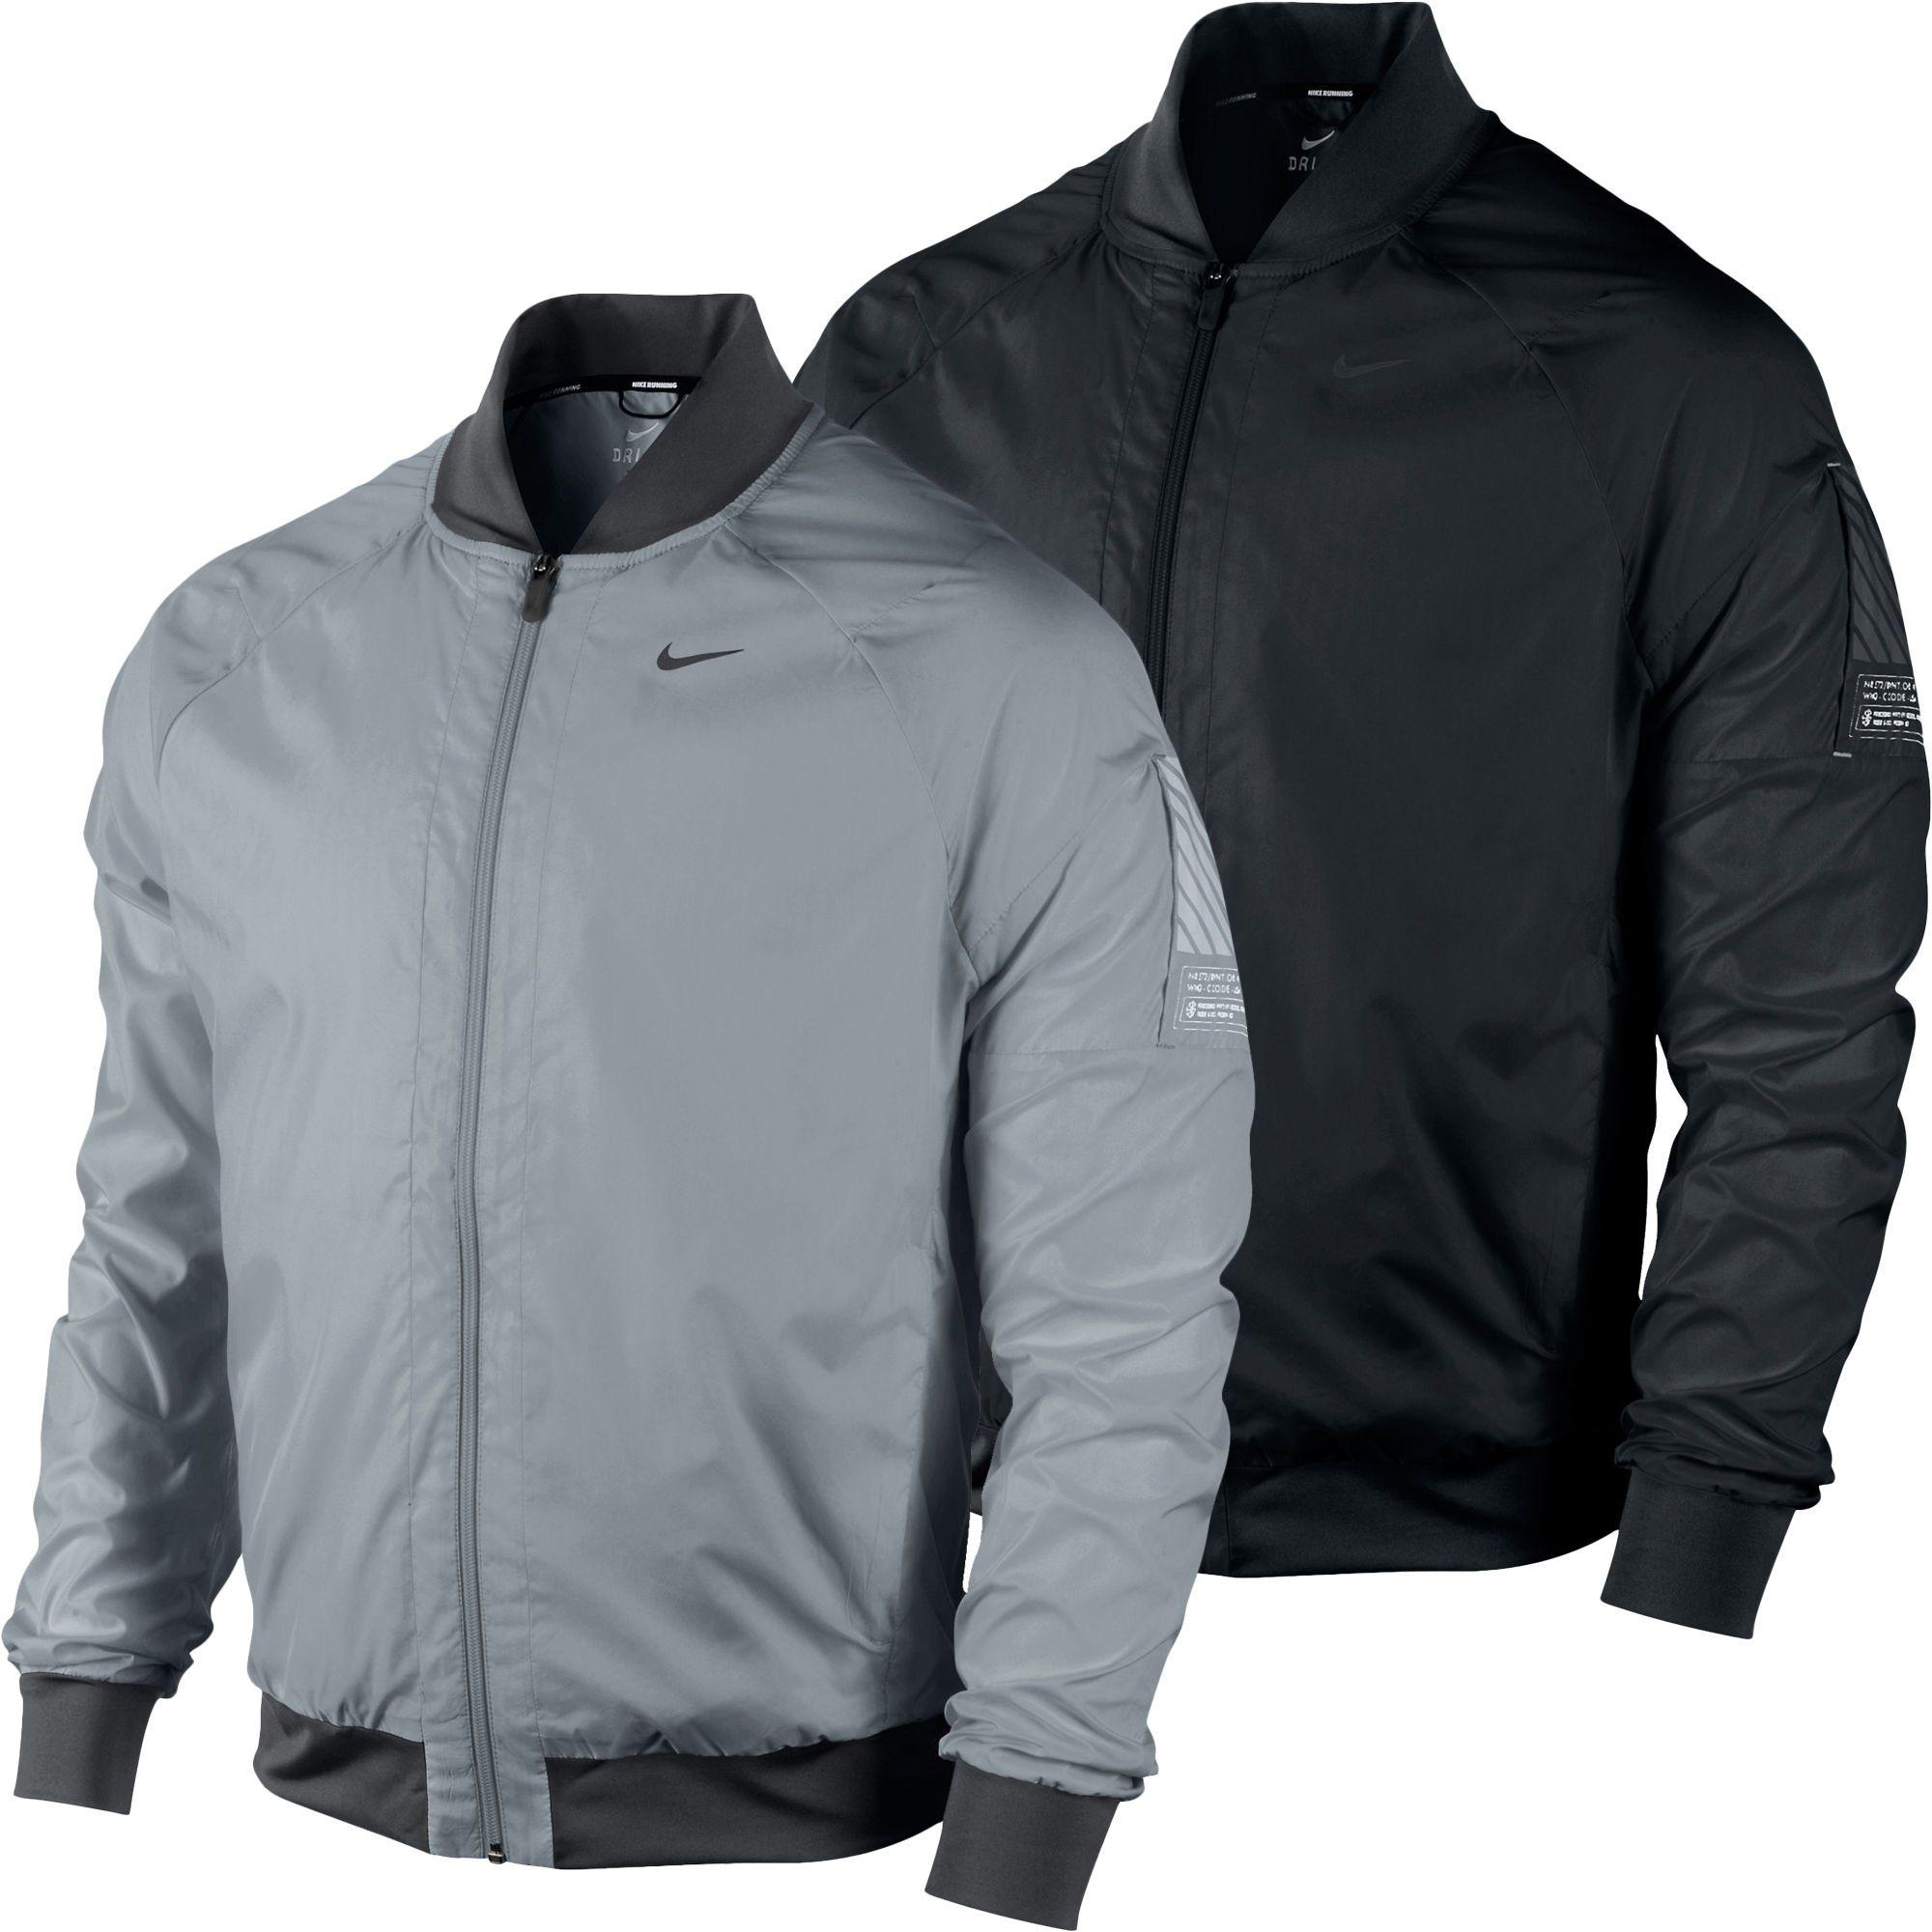 0742dd37c Wiggle | Nike Bomber Jacket SP13 | Running Windproof Jackets | men's ...